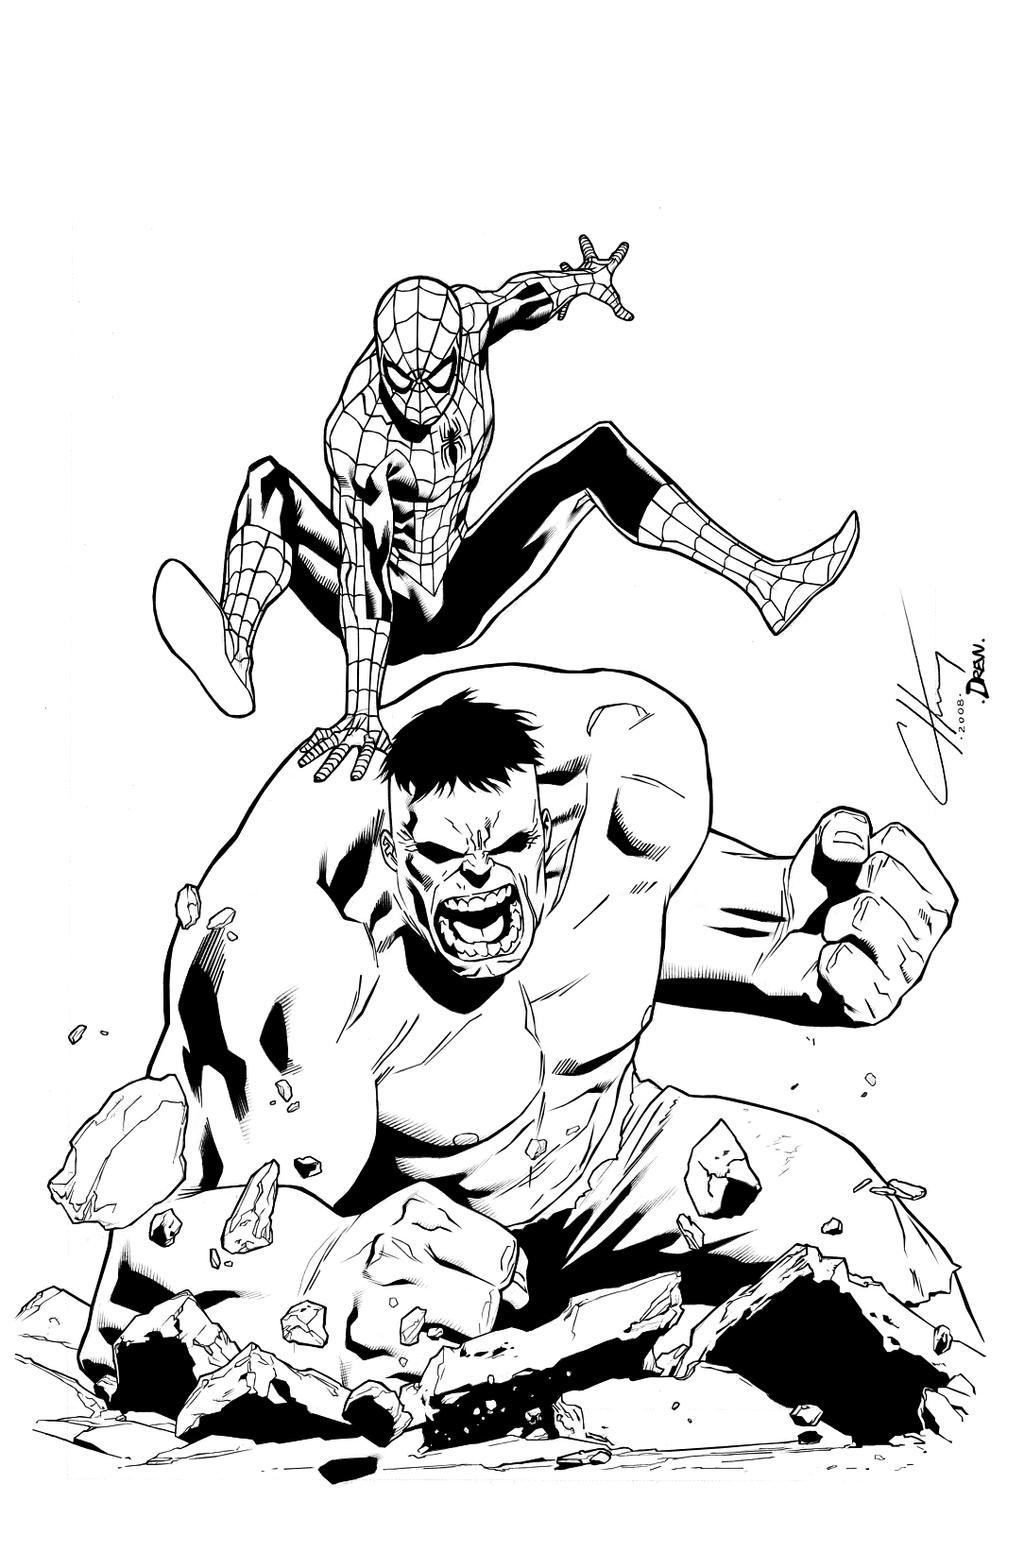 Spidey and hulk inks by drucpec on deviantart for Immagini spiderman da colorare